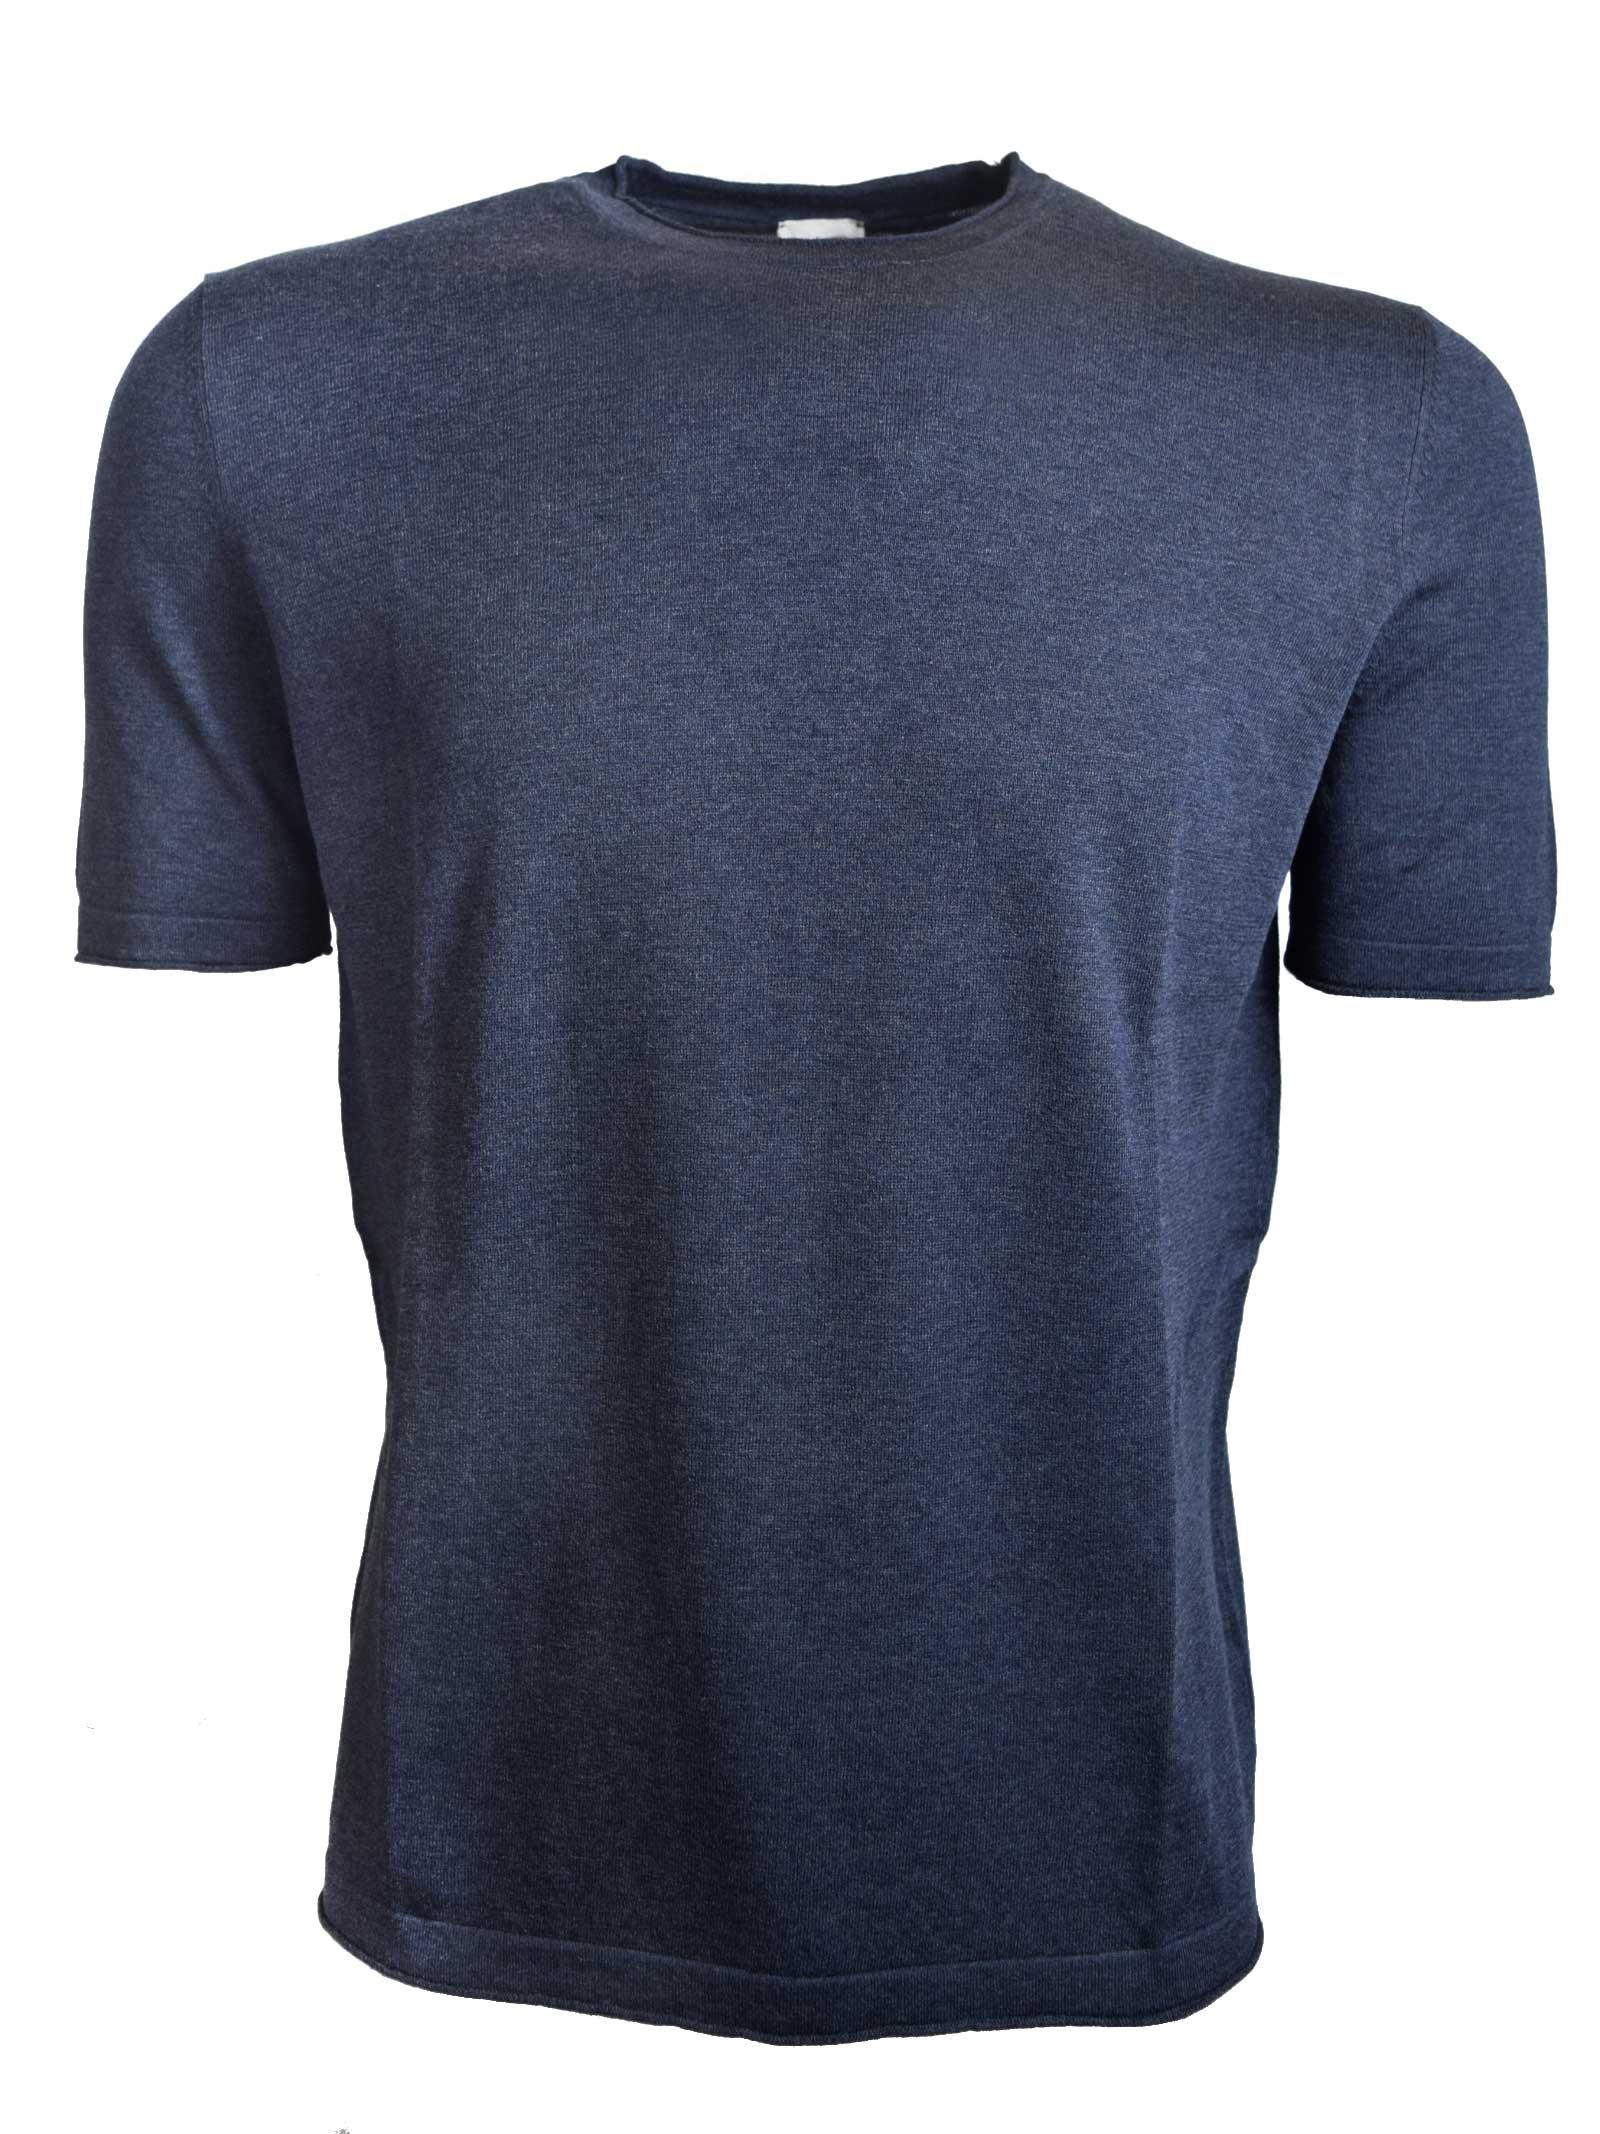 T-SHIRT IN SETA LAVATA H953 | T- shirt | 280392